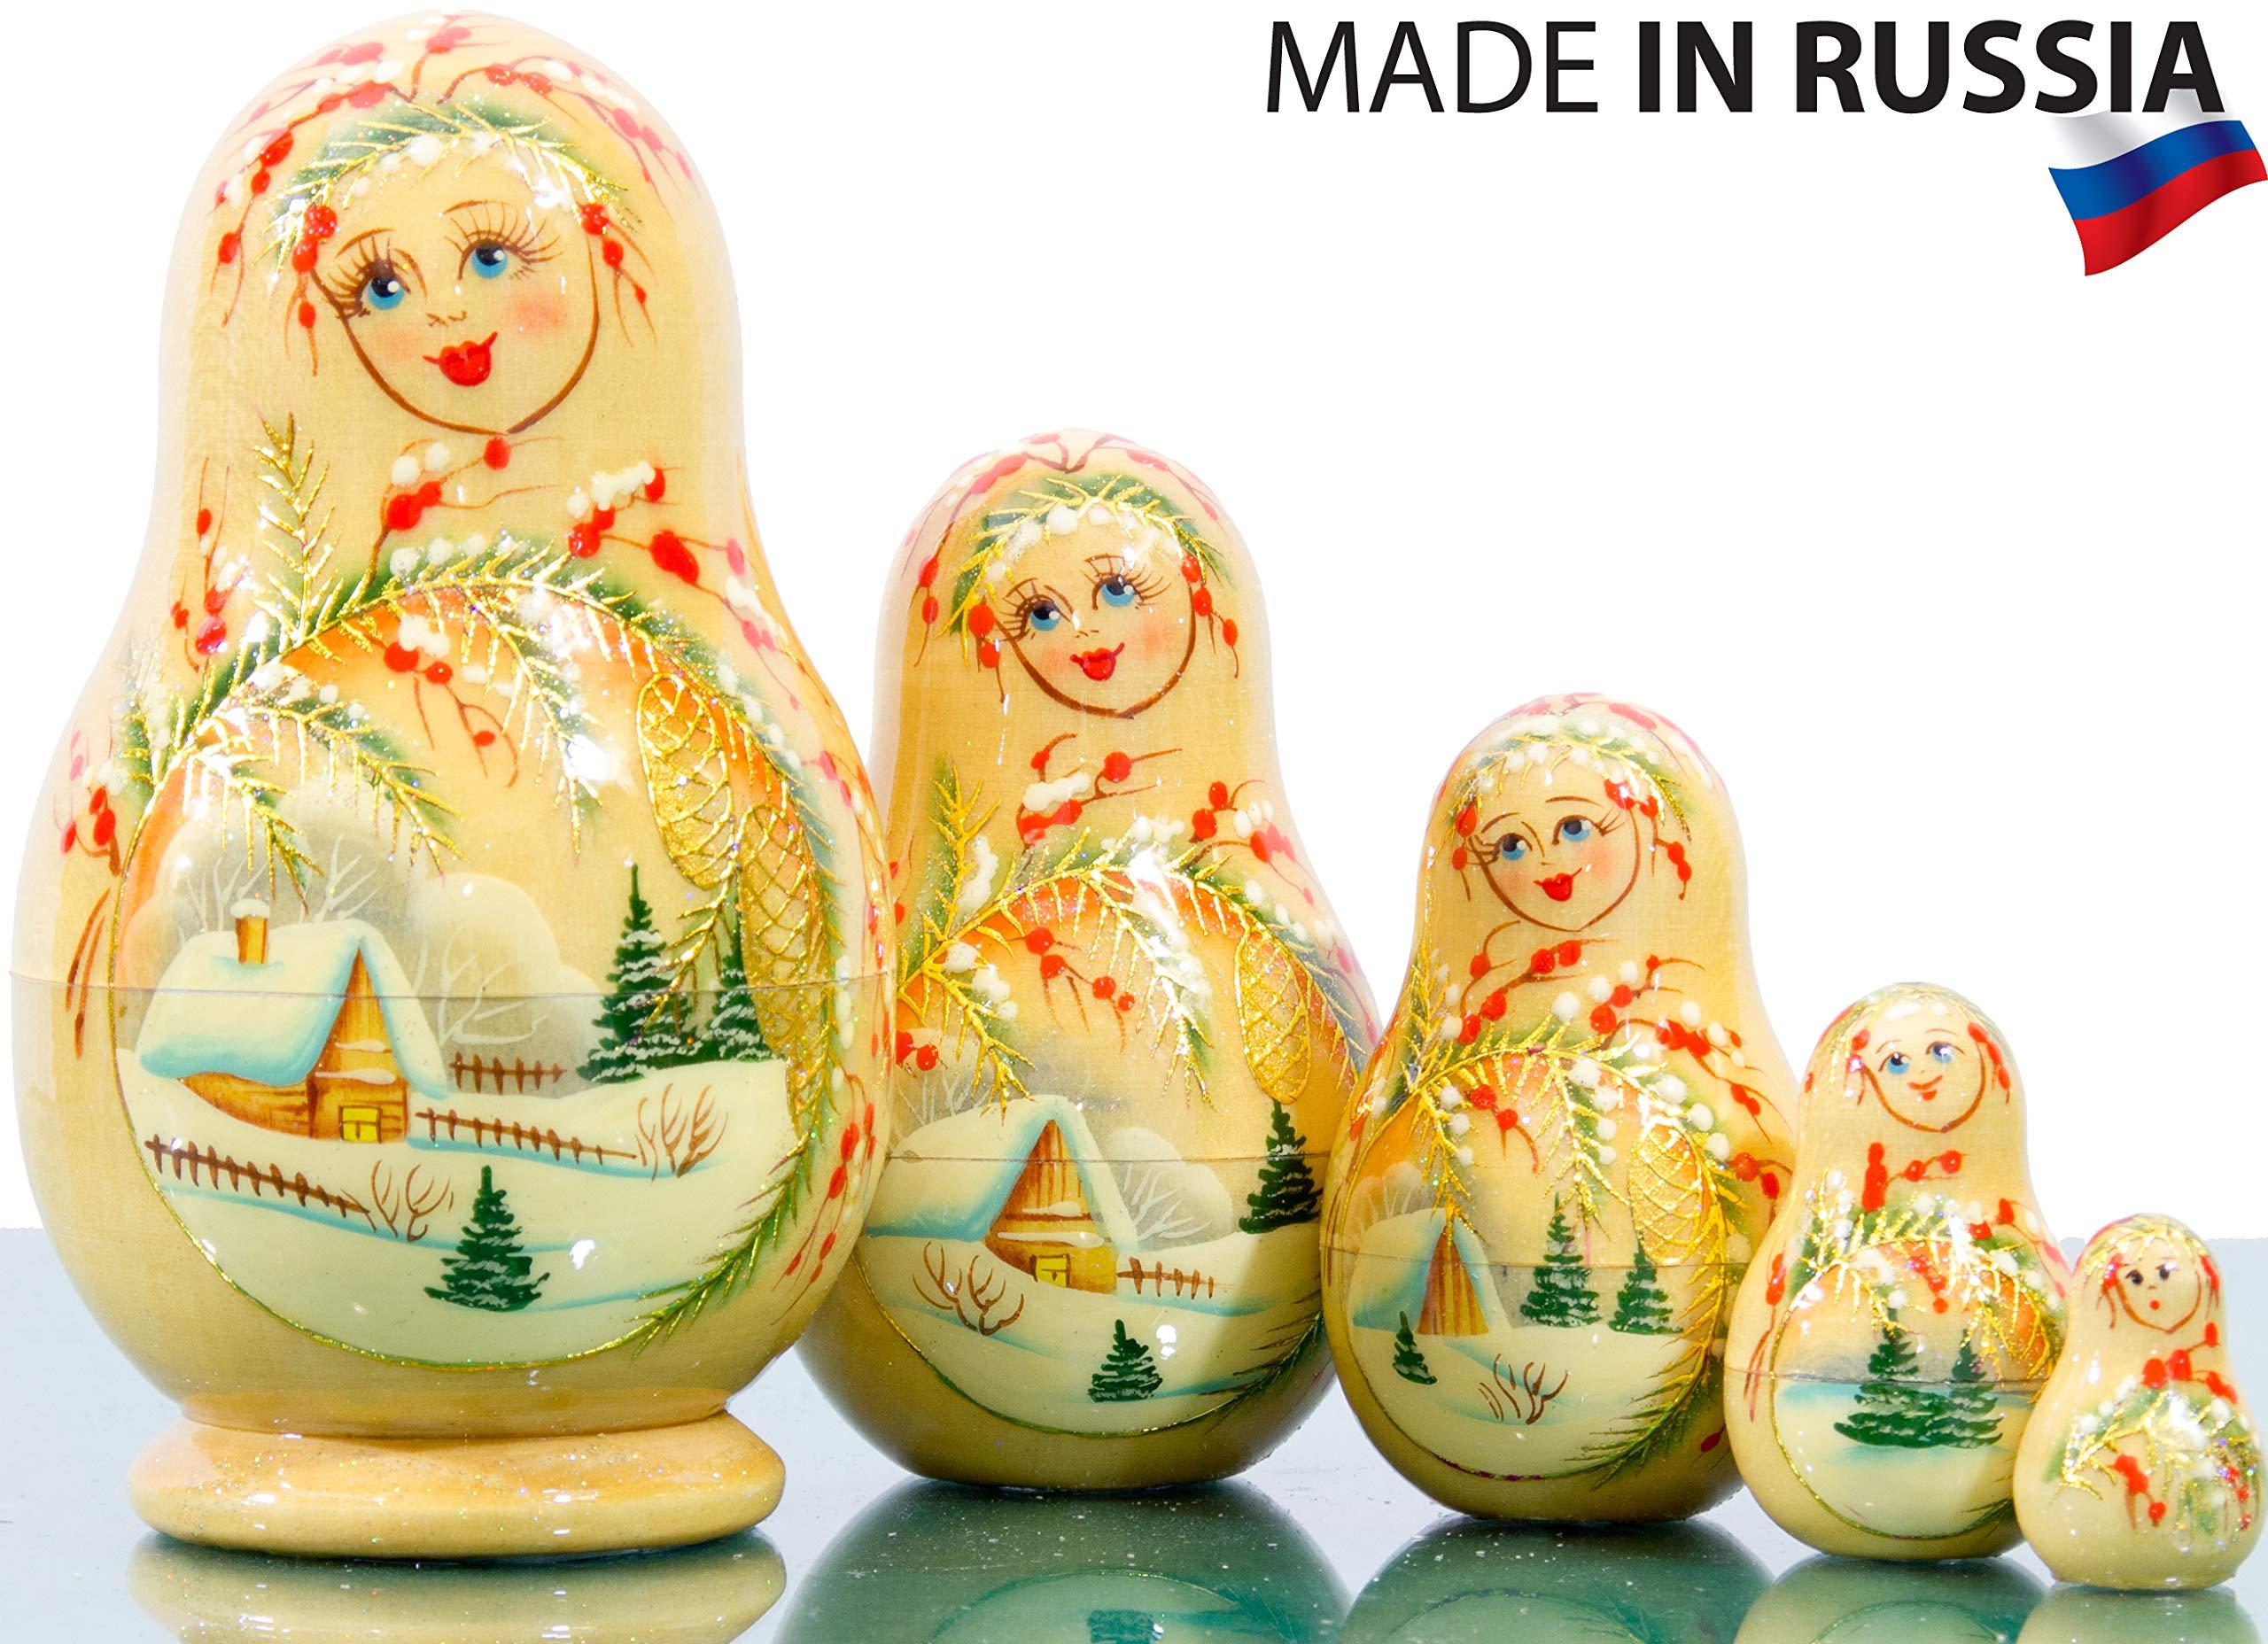 Russian Nesting Doll - Kirov - VJATKA - Hand Painted in Russia - Medium Size - Wooden Decoration Gift Doll - Matryoshka Babushka (Design B, 4.75`` (5 Dolls in 1))